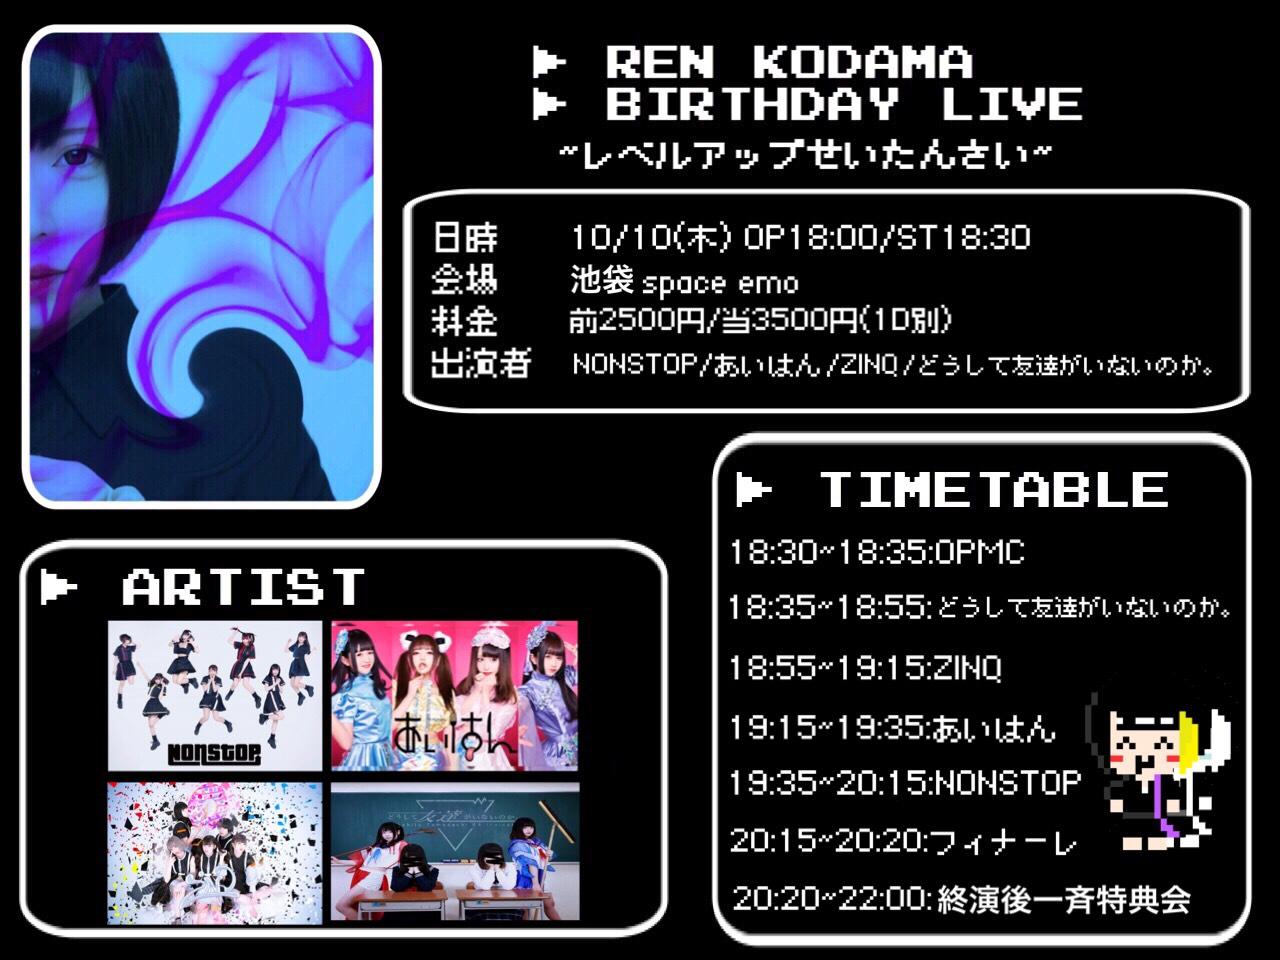 NONSTOP REN KODAMA BIRTHDAY LIVE 〜レベルアップせいたんさい〜